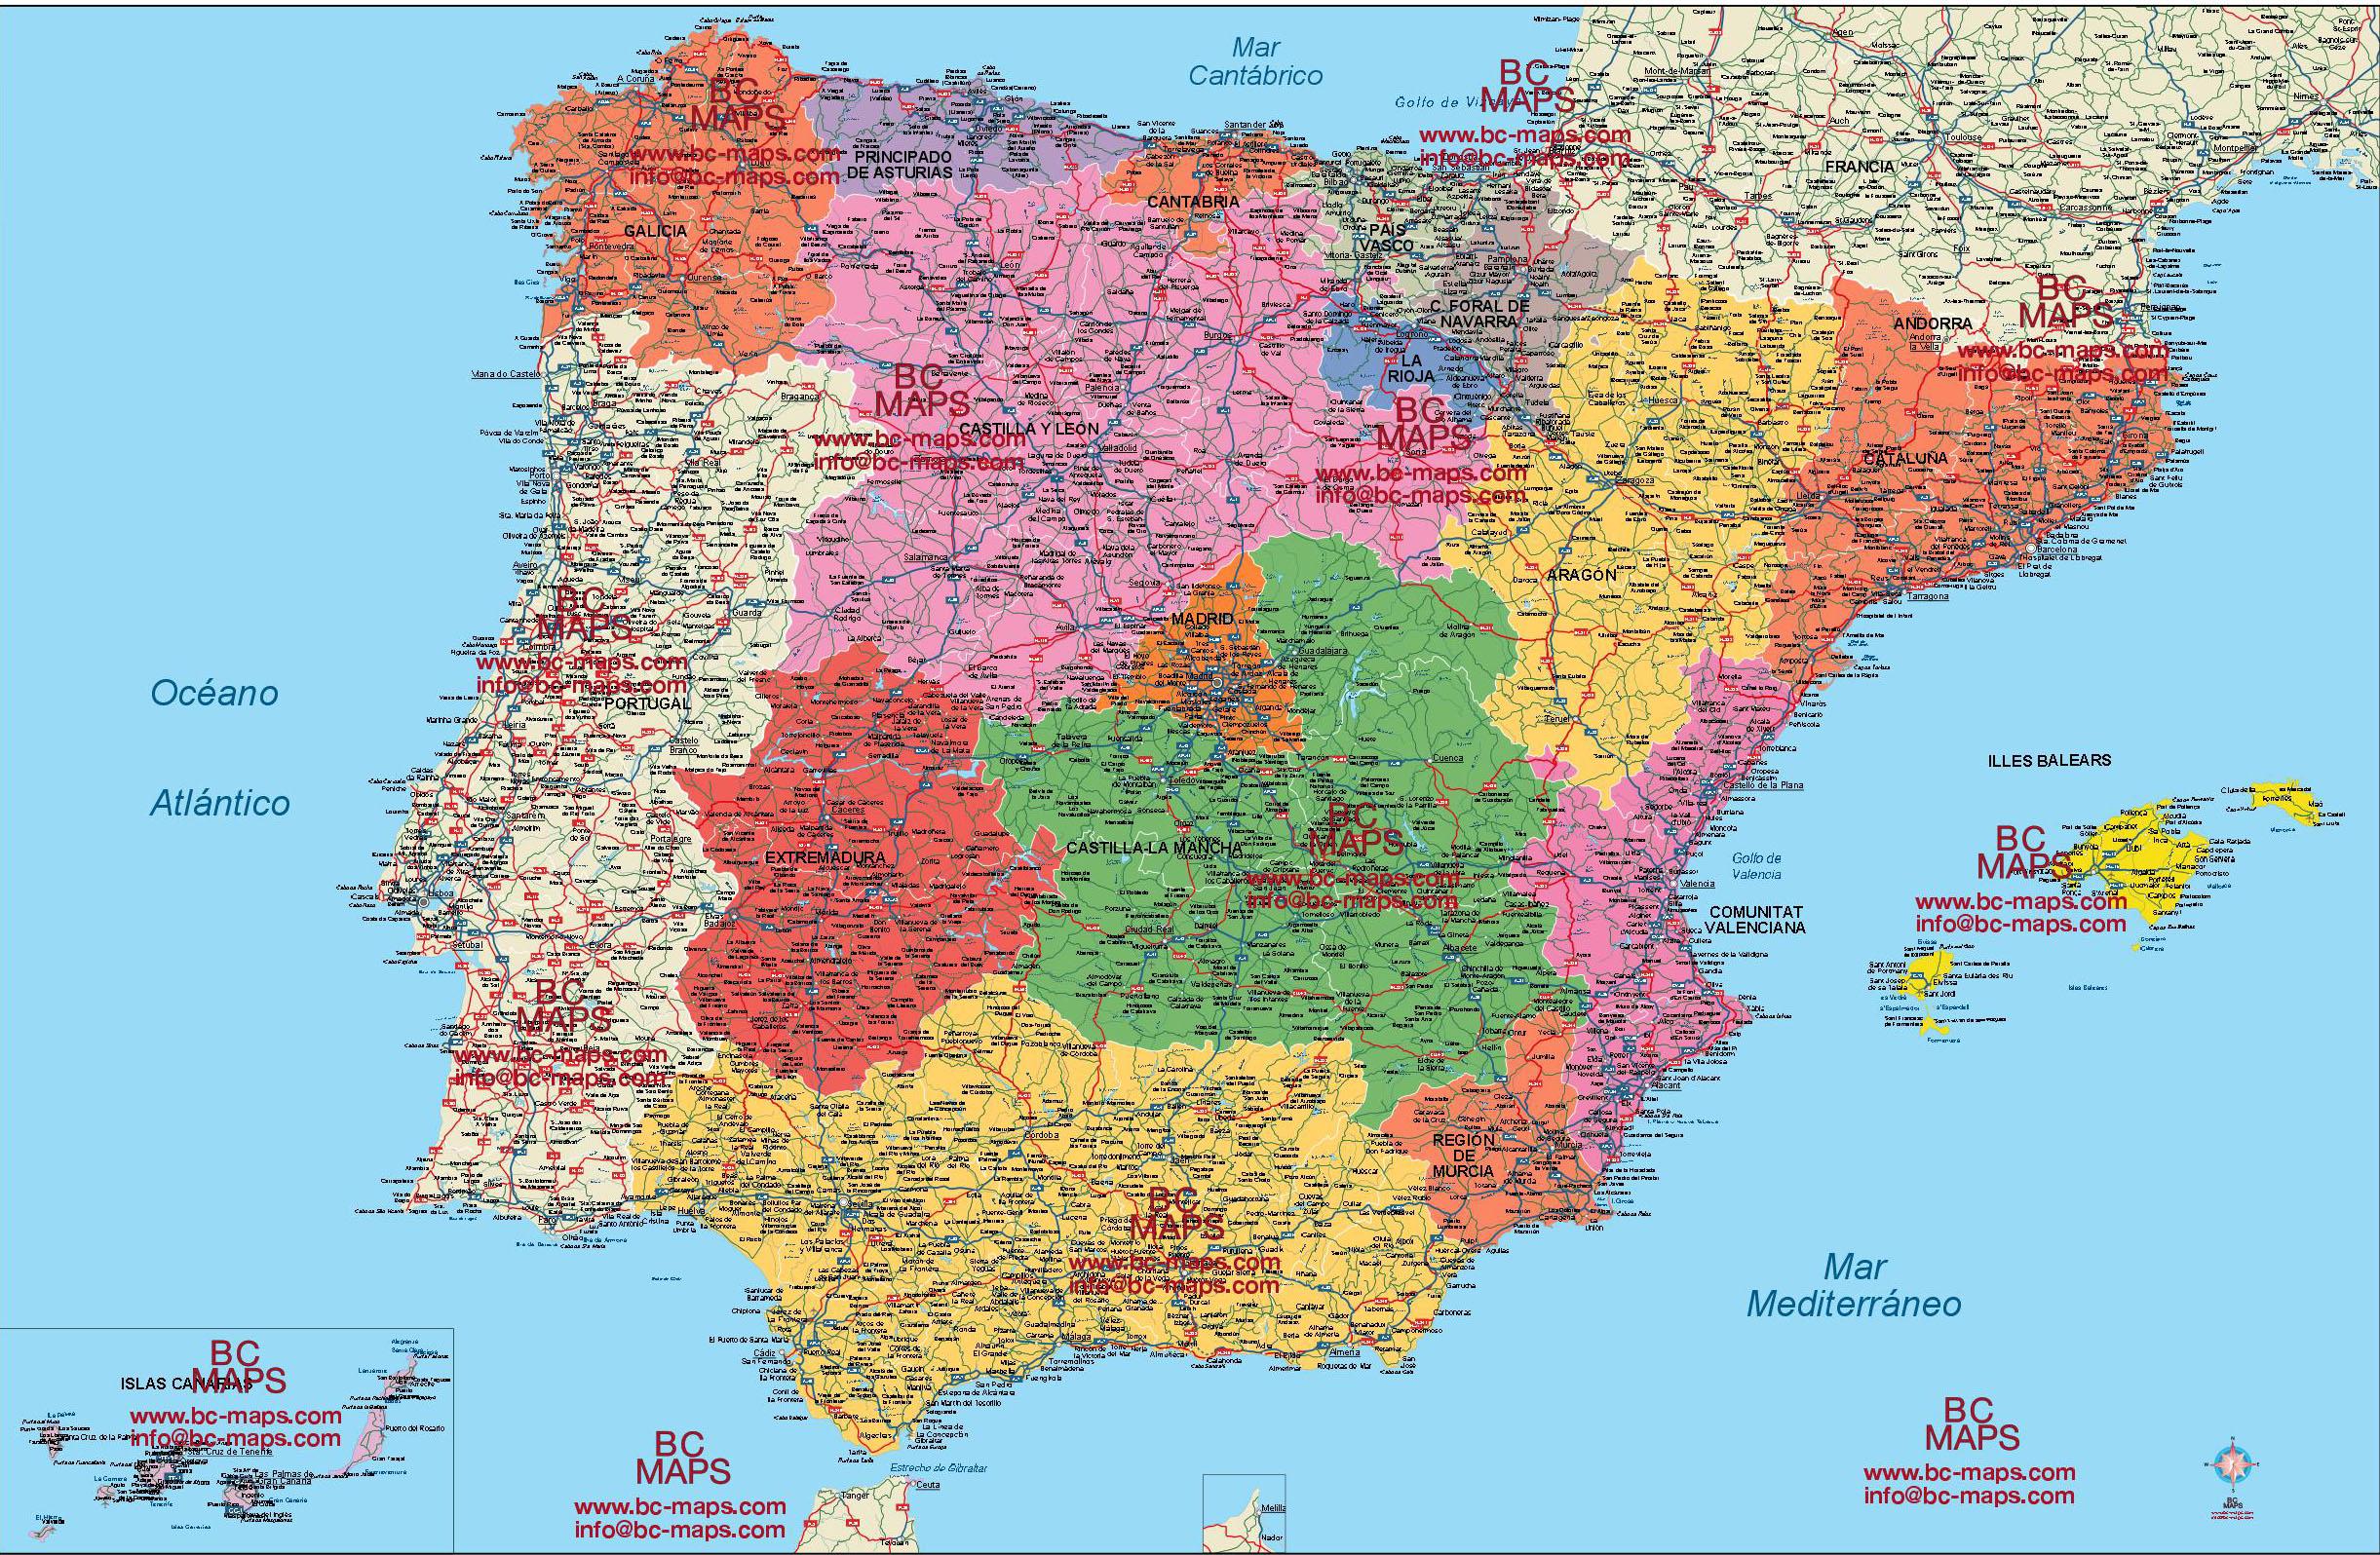 Mapa Tematico De Espana.Mapas Vectoriales De Espana Ciudades Ccaa Comarcas